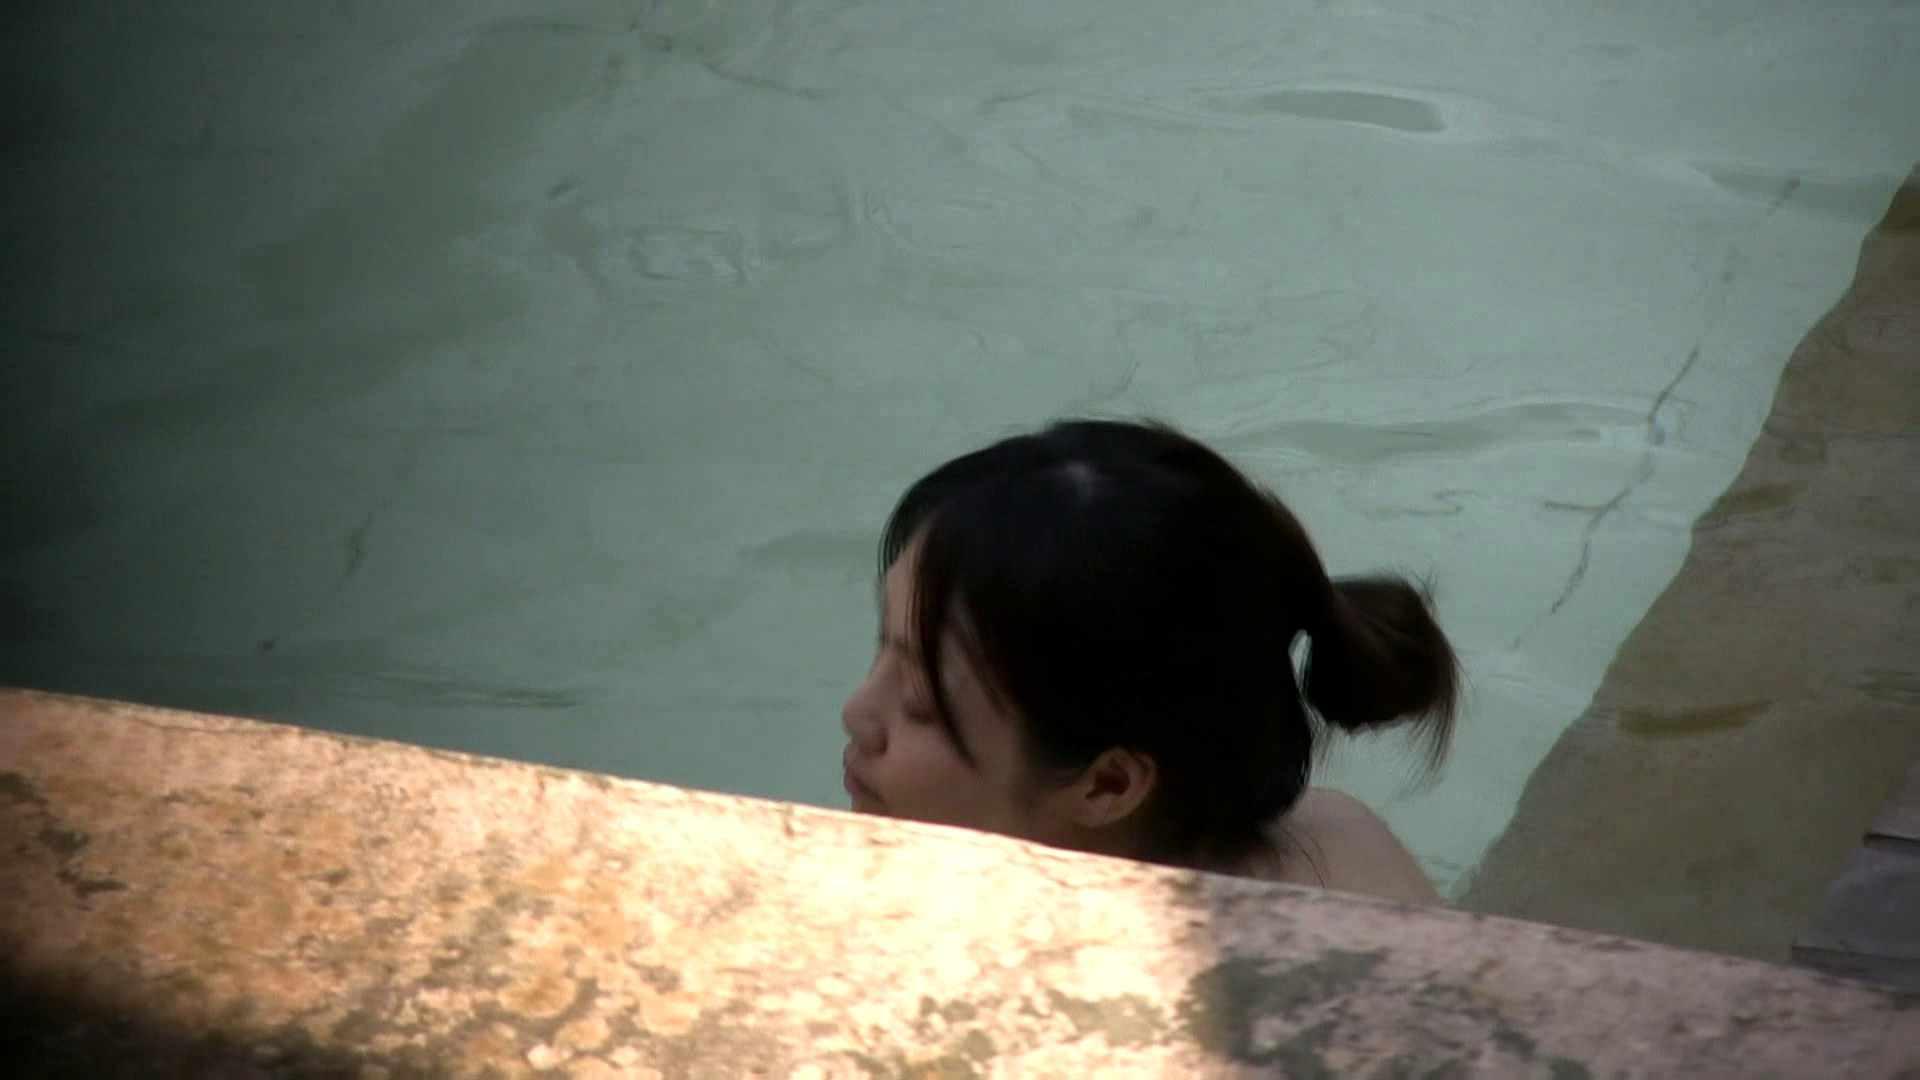 Aquaな露天風呂Vol.652 美しいOLの裸体 SEX無修正画像 79pic 5